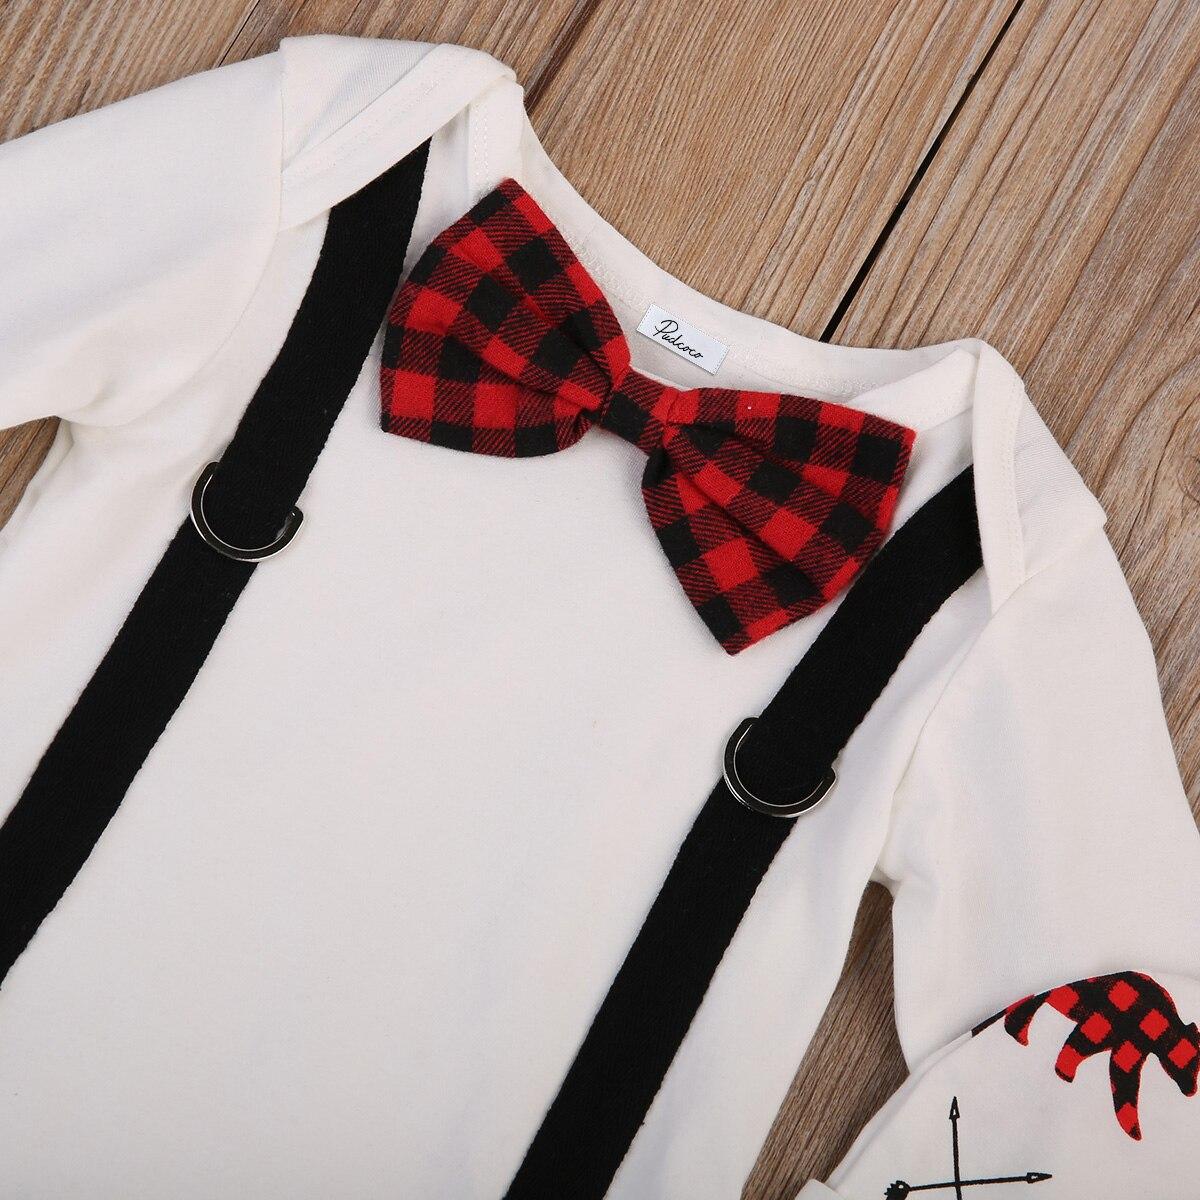 Newborn Baby Boys Gentleman Cotton Soft Long Sleeve Romper Bodysuit Deer Pants Outfits Clothes 0-24M